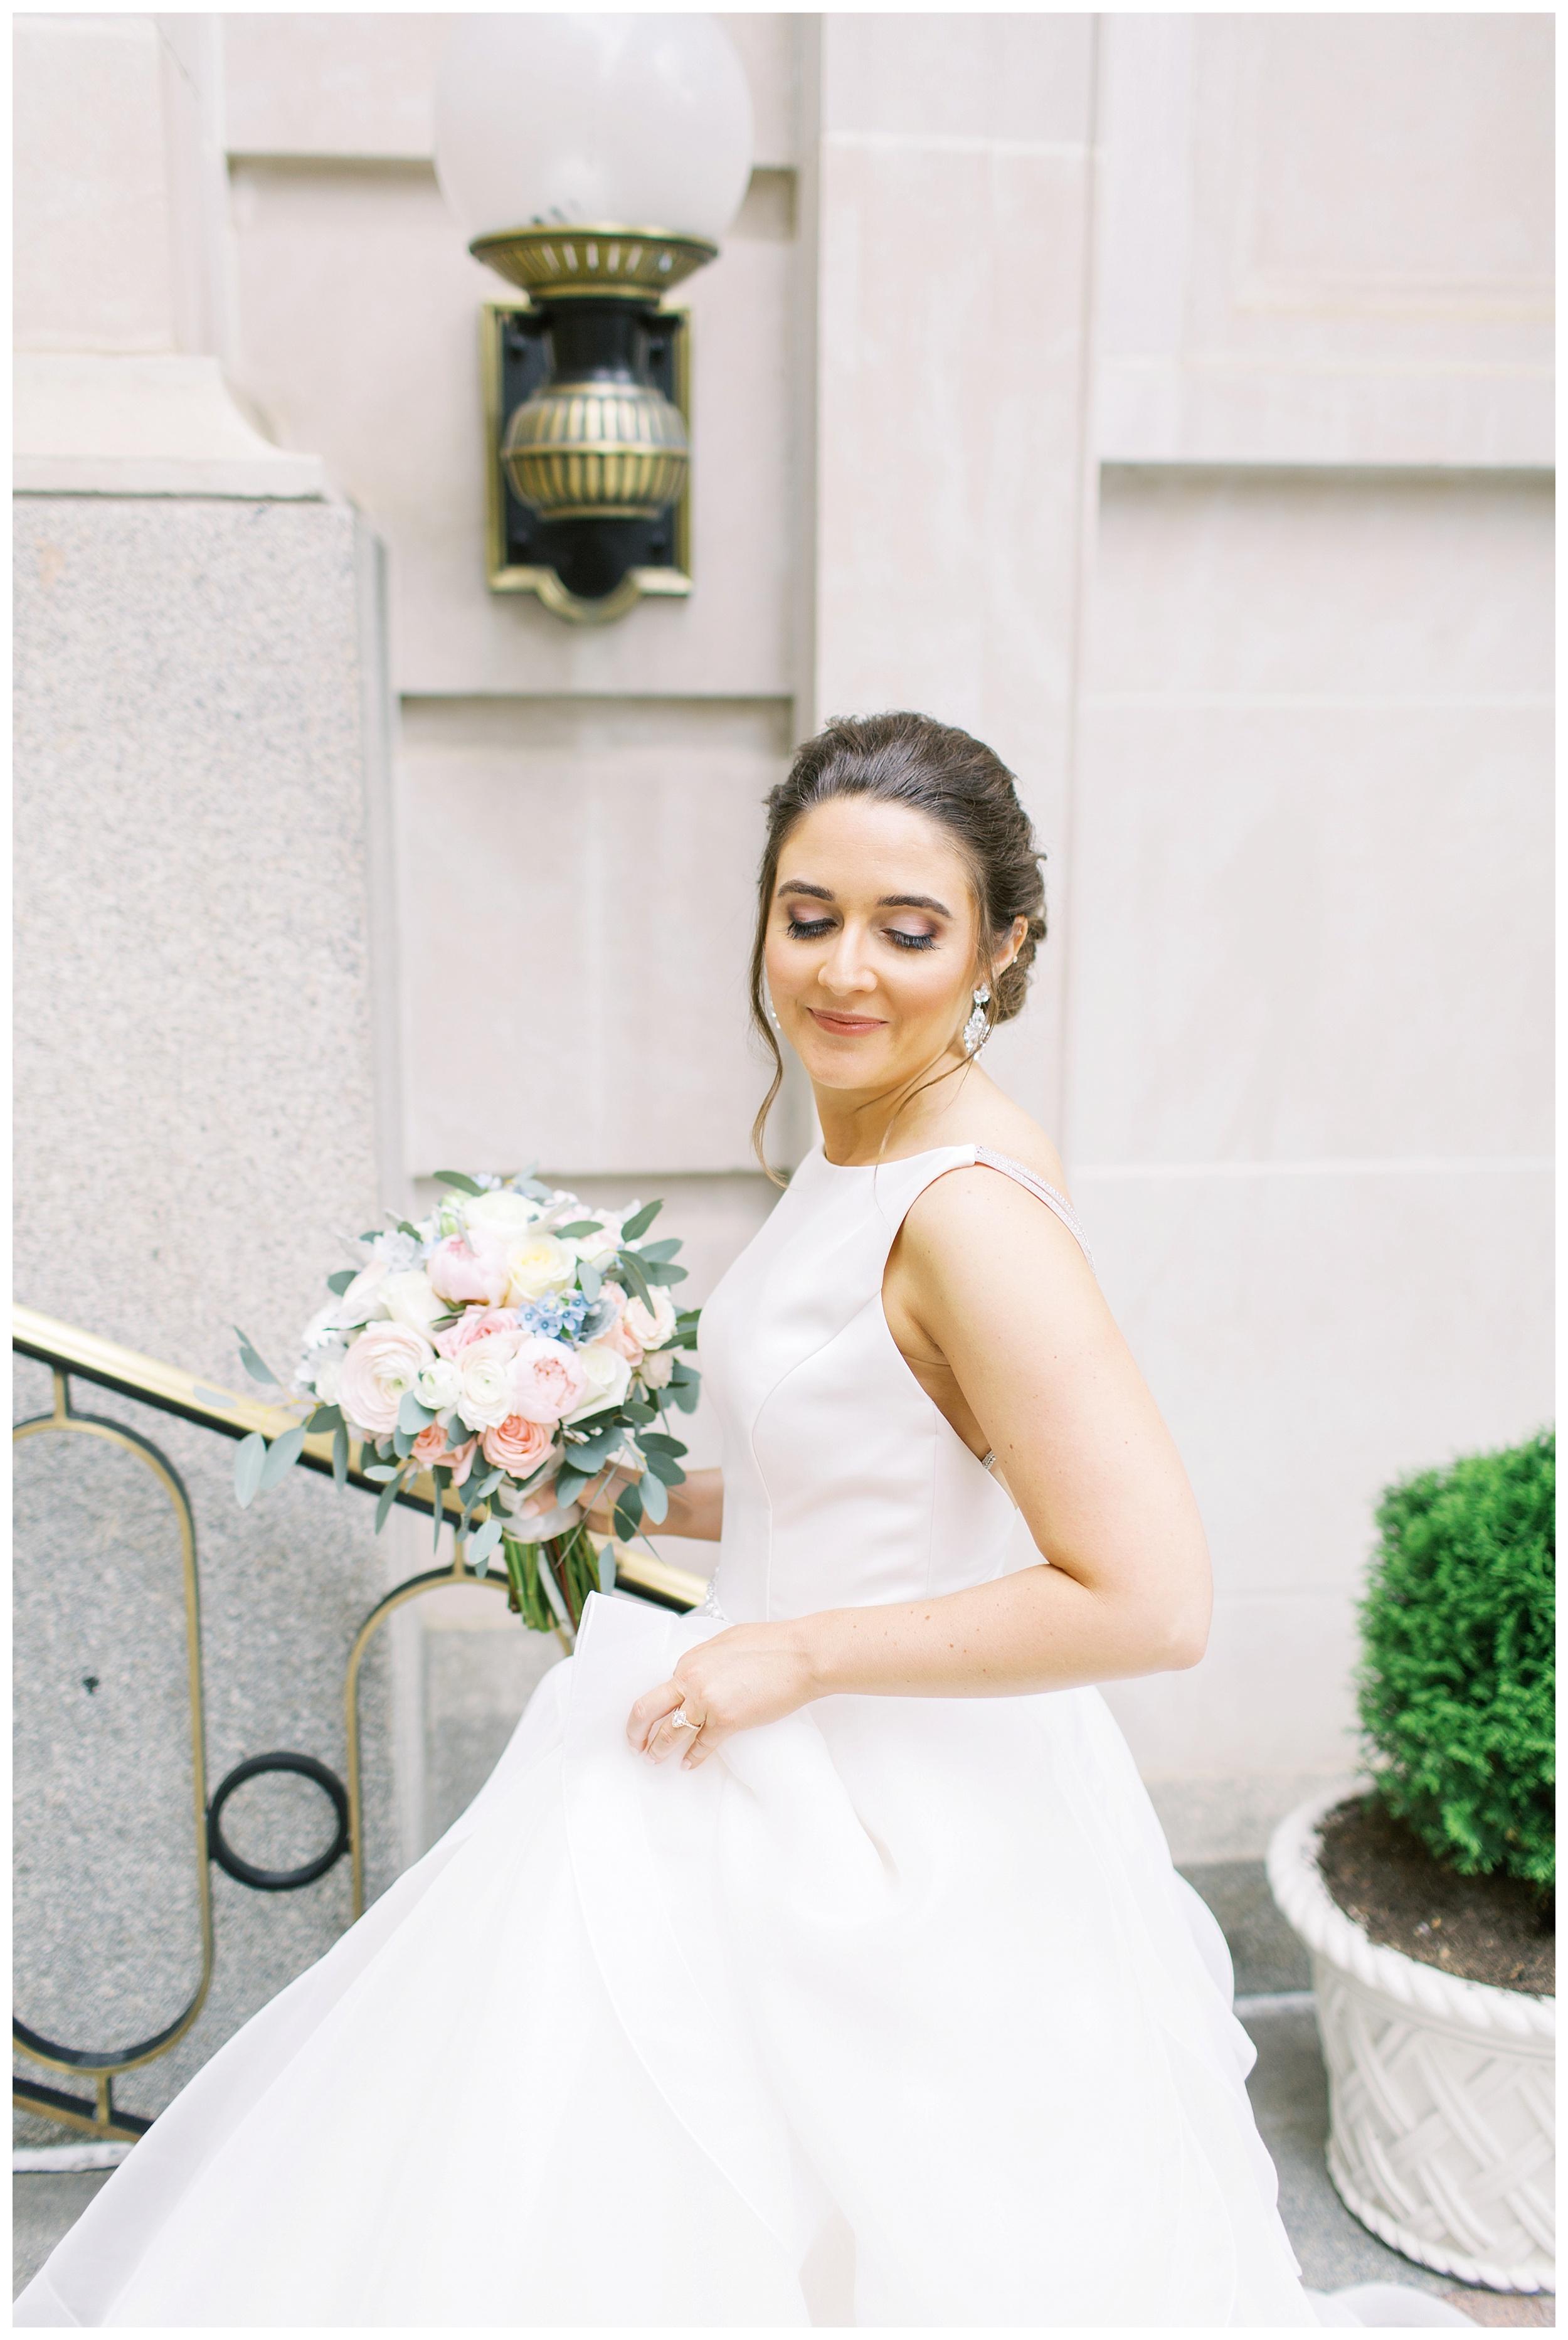 DAR Constitution Hall Wedding Wedding | Daughters of the American Revolution Wedding | District of Columbia Film Wedding Photographer Kir Tuben_0037.jpg